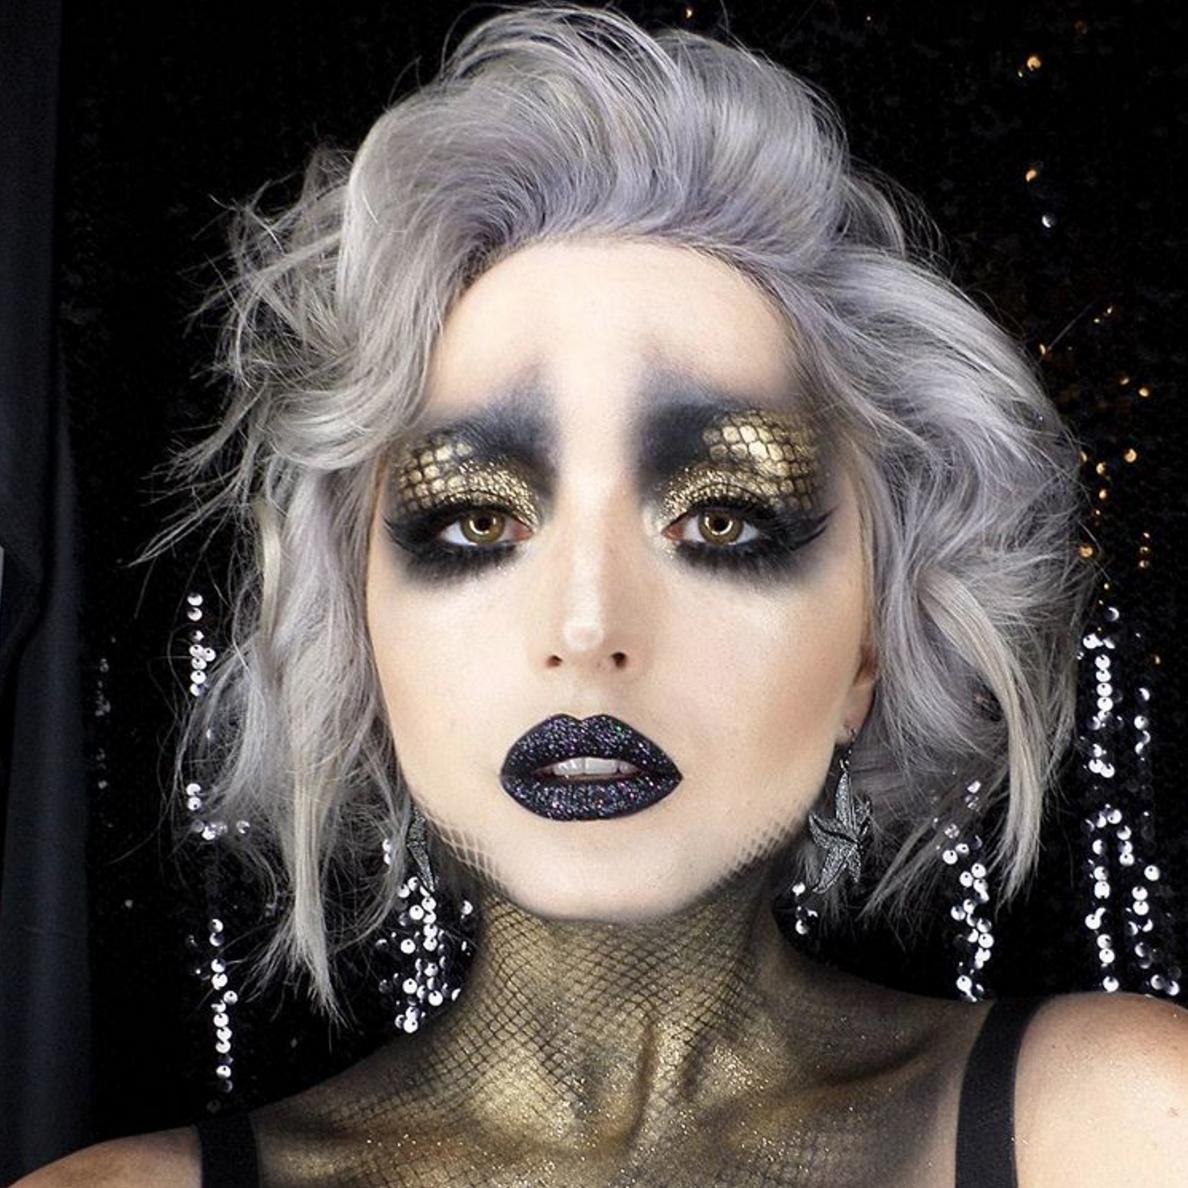 Fashion style Mermaid Dark makeup for lady